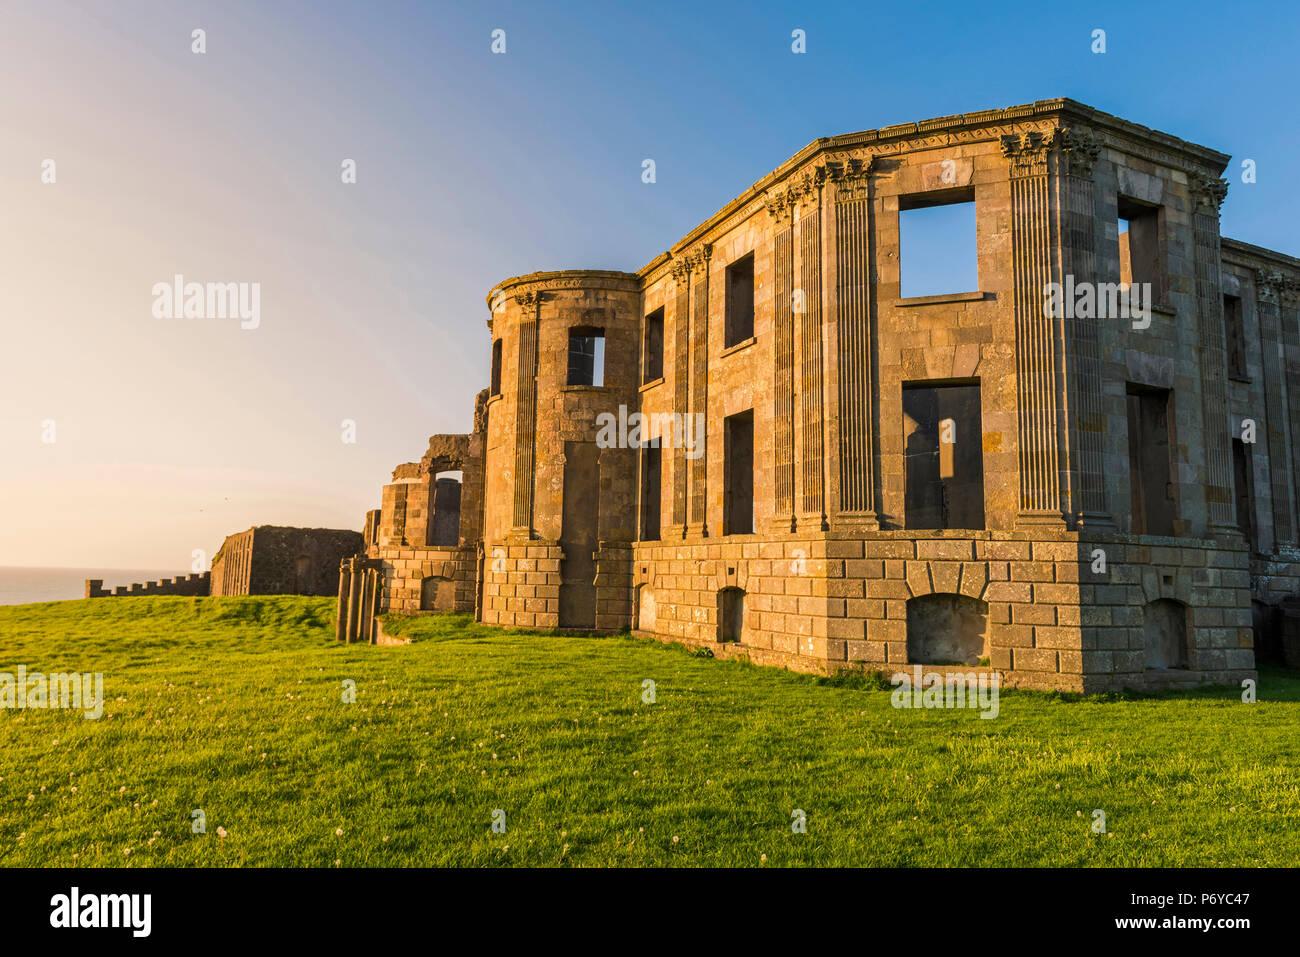 Downhill Castle, Castlerock, County Antrim, Ulster region, northern Ireland, United Kingdom. - Stock Image